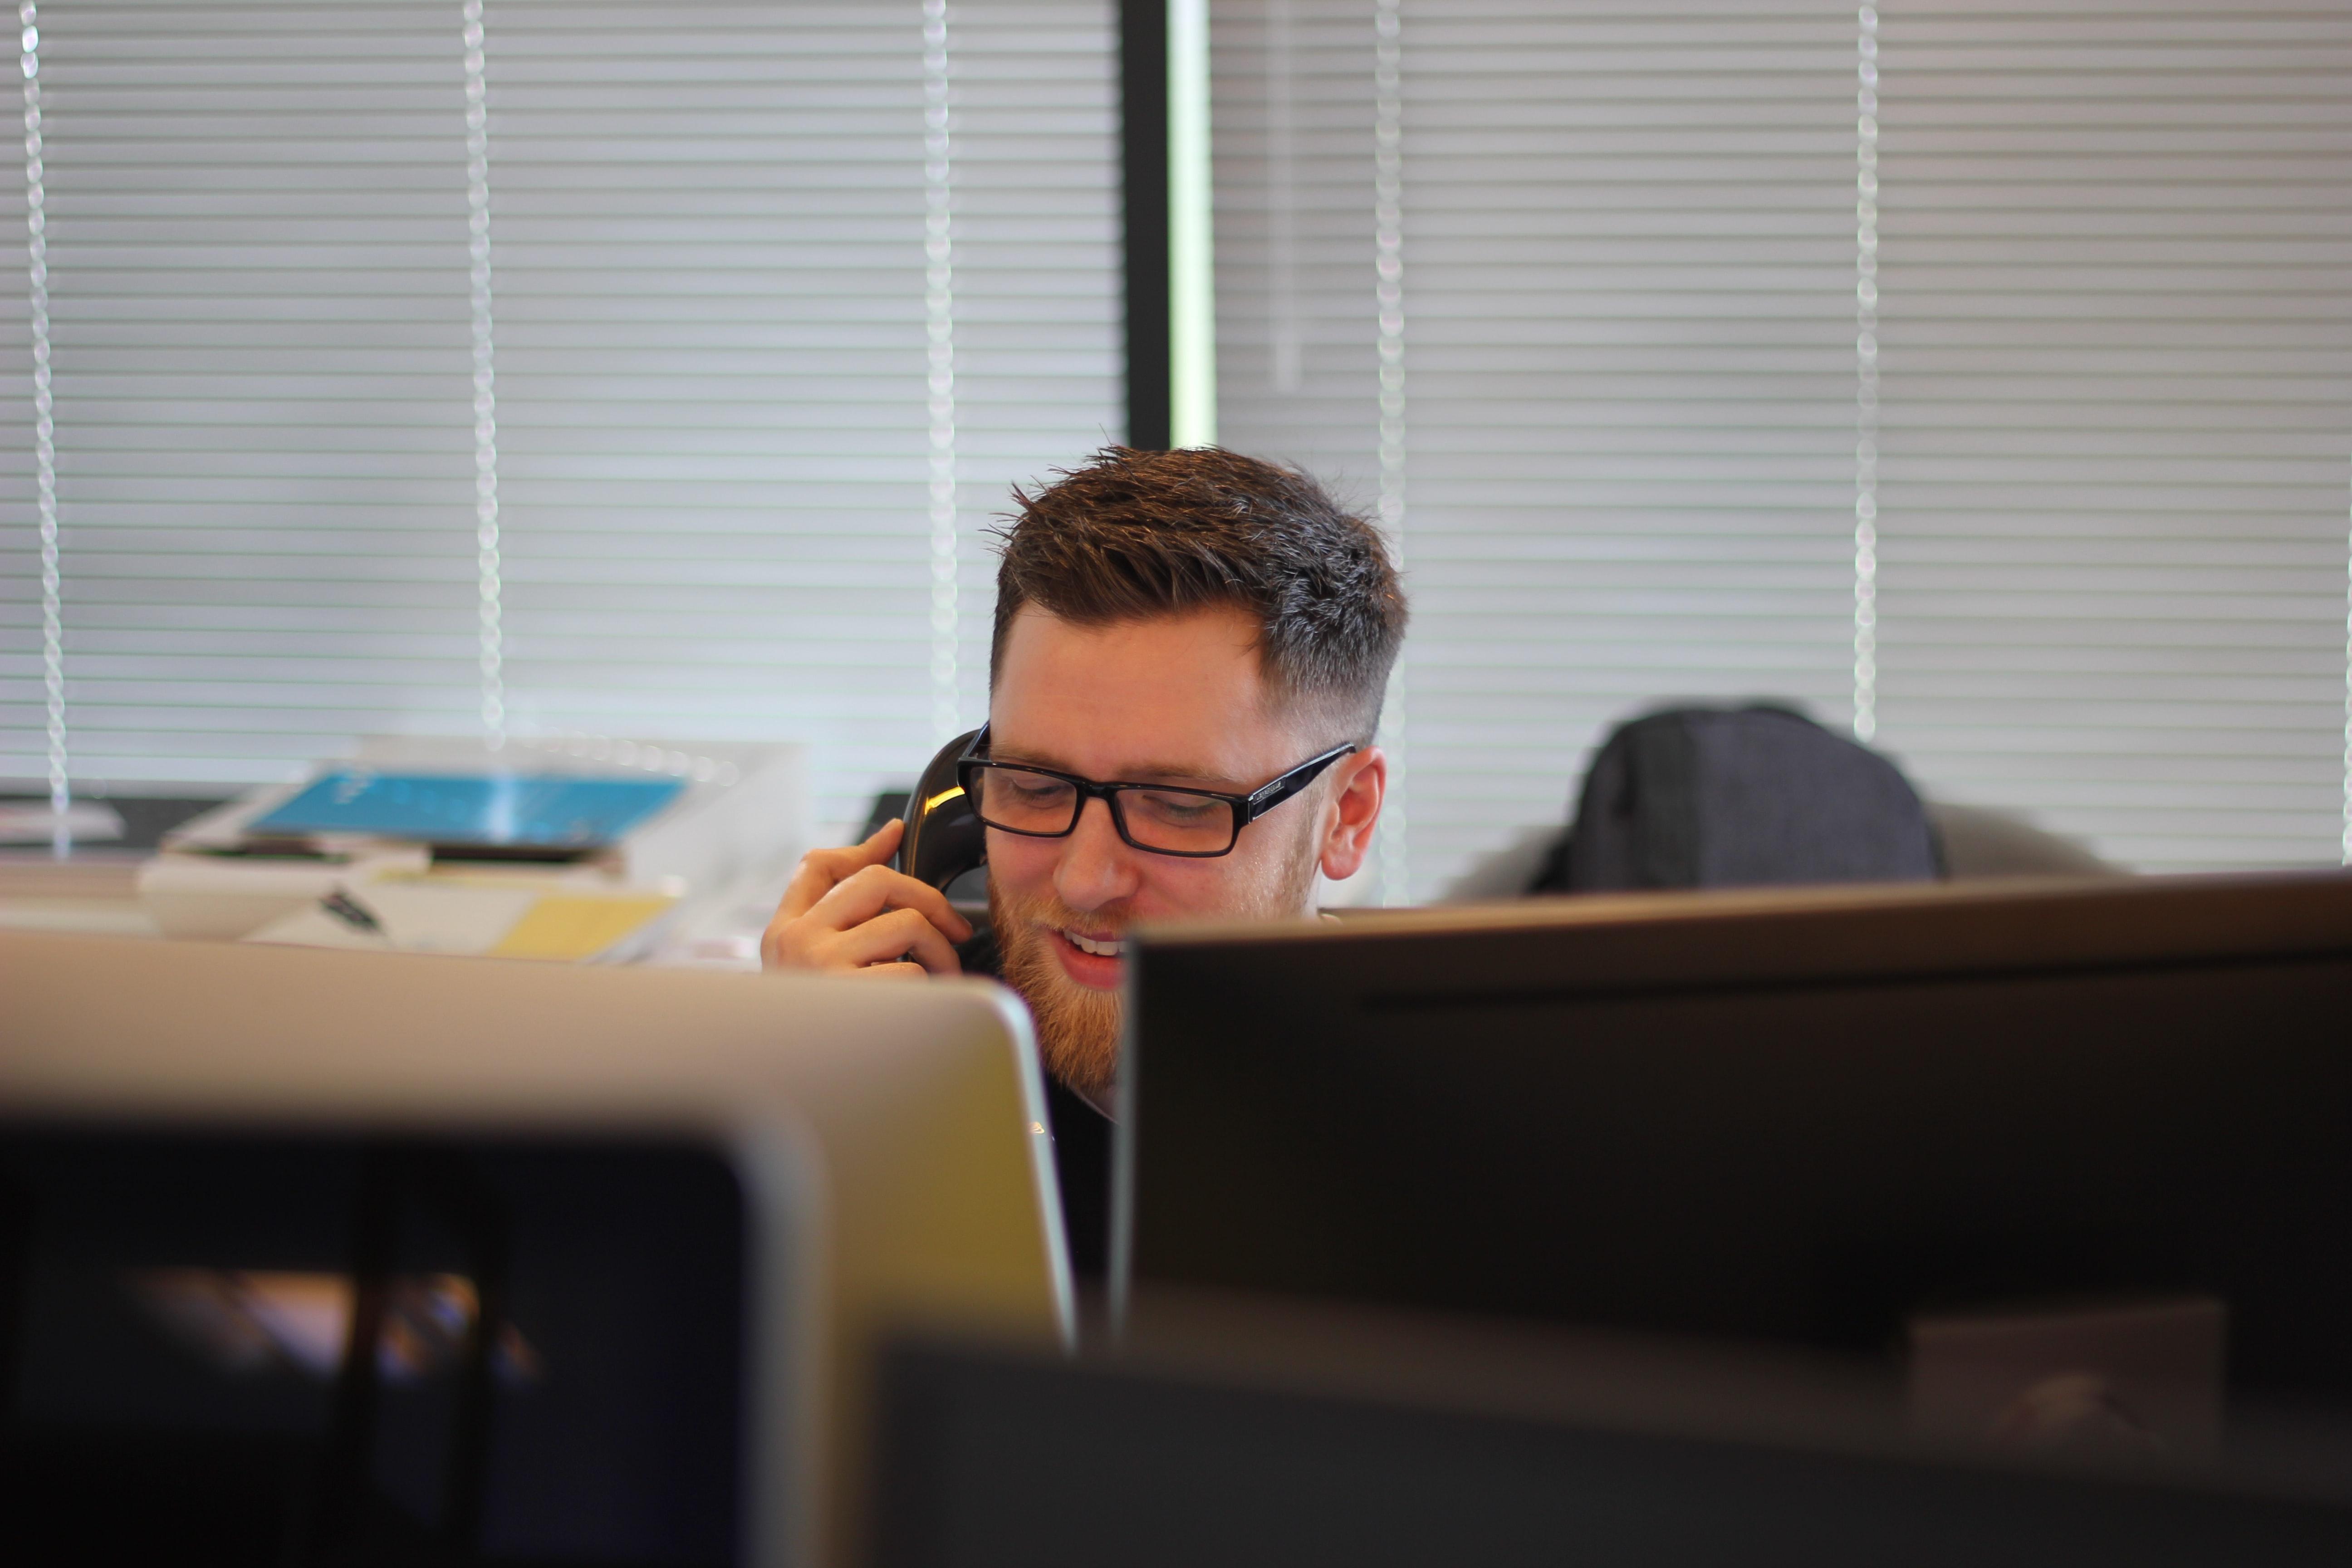 Man on phone behind his computer